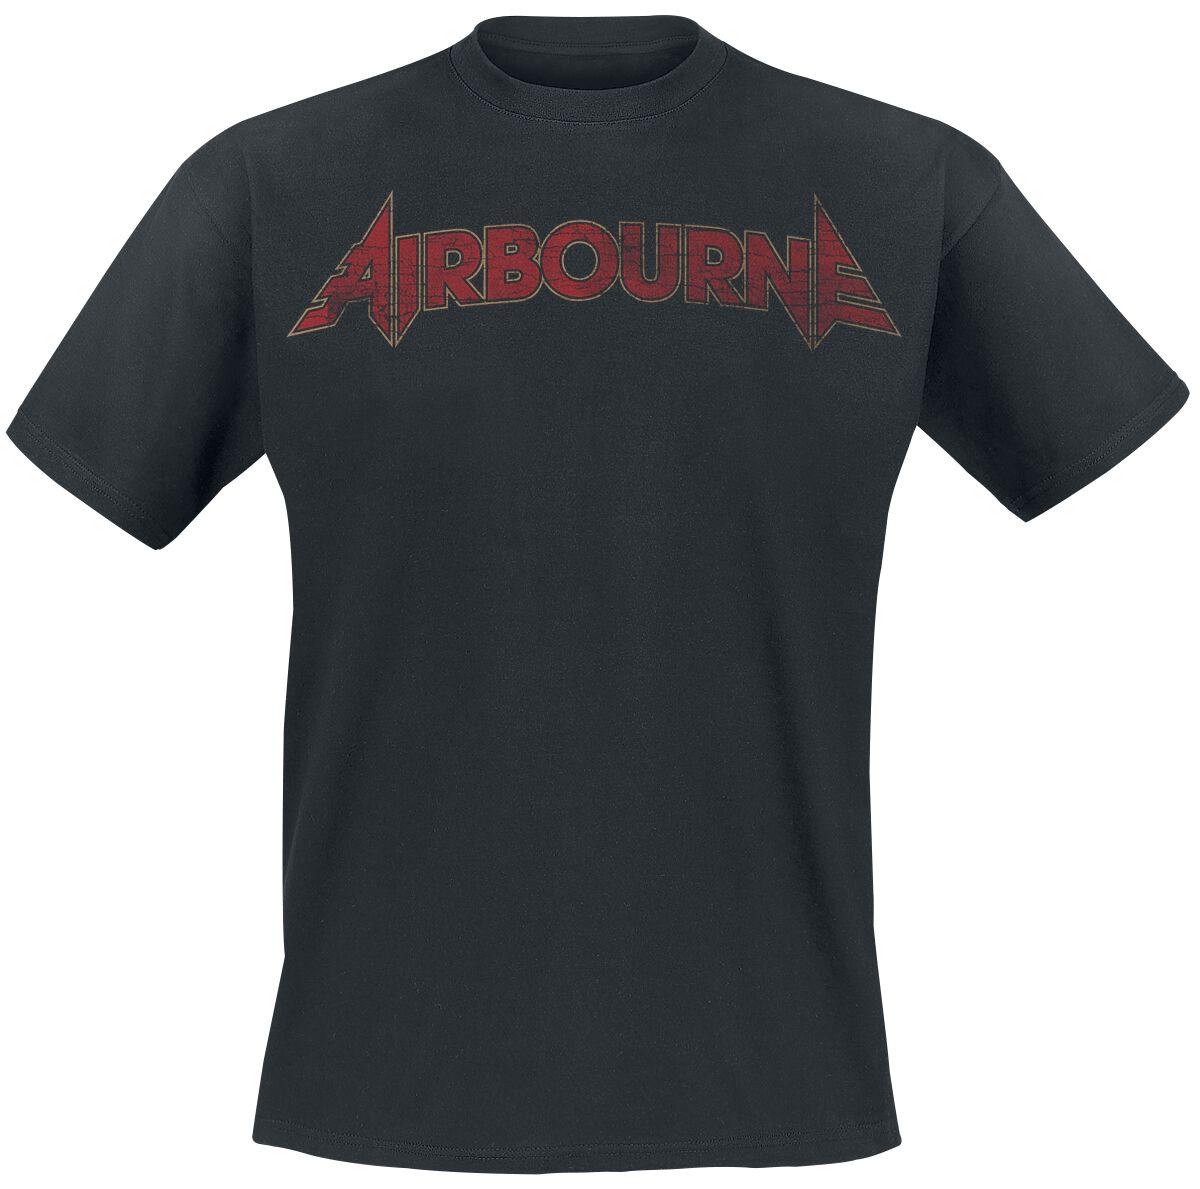 Image of Airbourne Cracked Logo T-Shirt schwarz